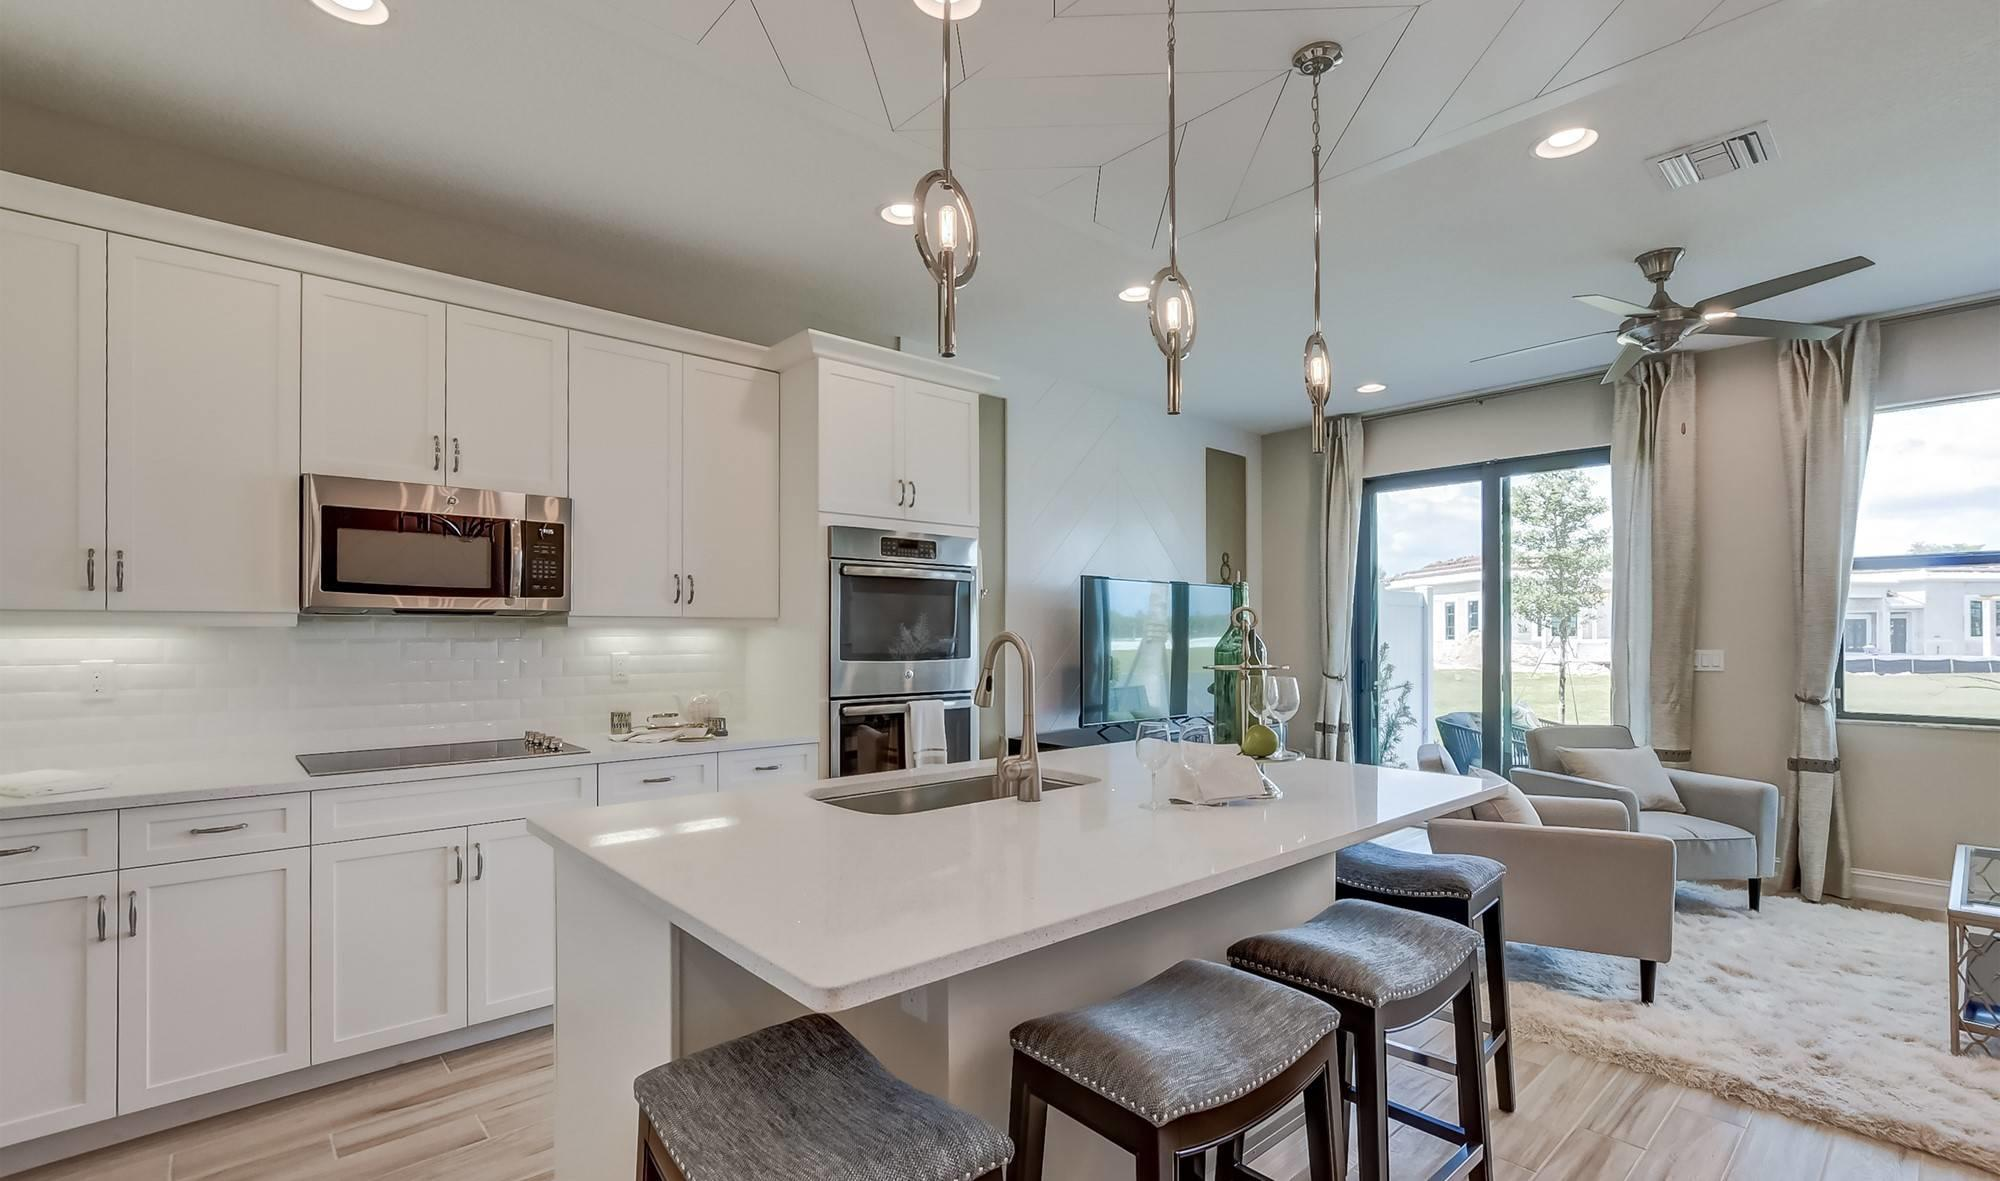 9454 Glider Way, Boca Raton, Florida 33428, 3 Bedrooms Bedrooms, ,2.1 BathroomsBathrooms,Townhouse,For Sale,Enclave at Boca Dunes,Glider,1,RX-10431018